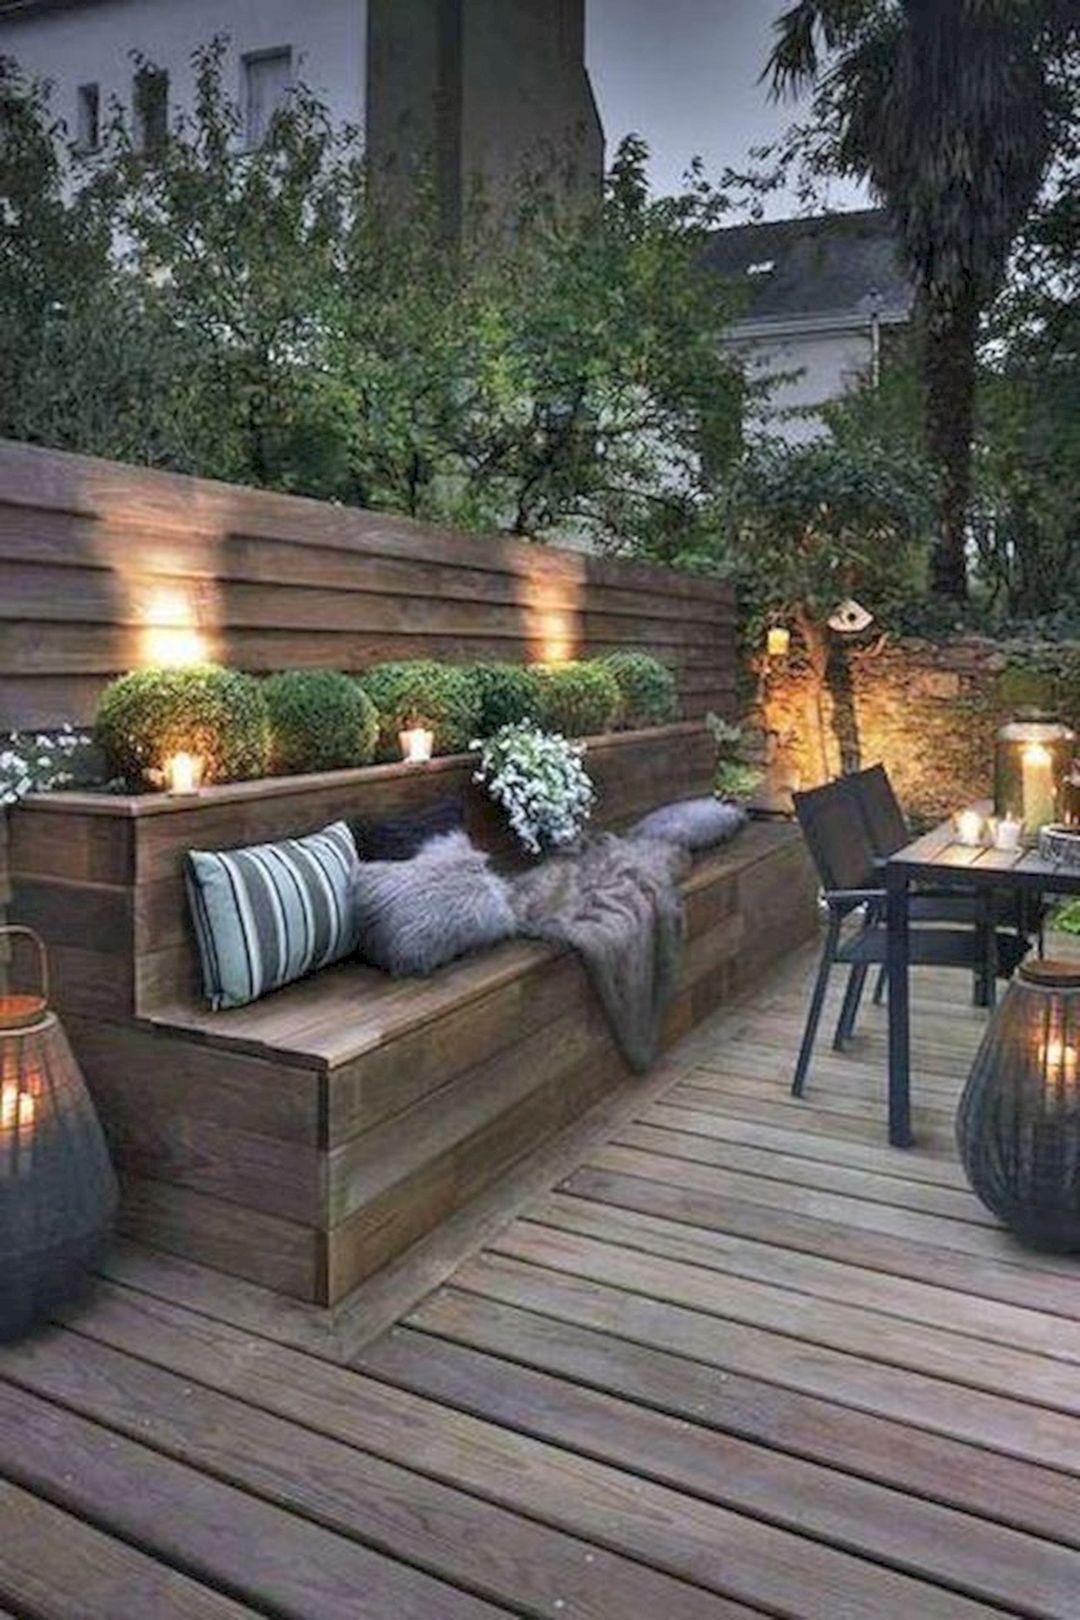 15 Modern Deck Patio Ideas For Backyard Design And Decoration Ideas – https://pickndecor.com/interior